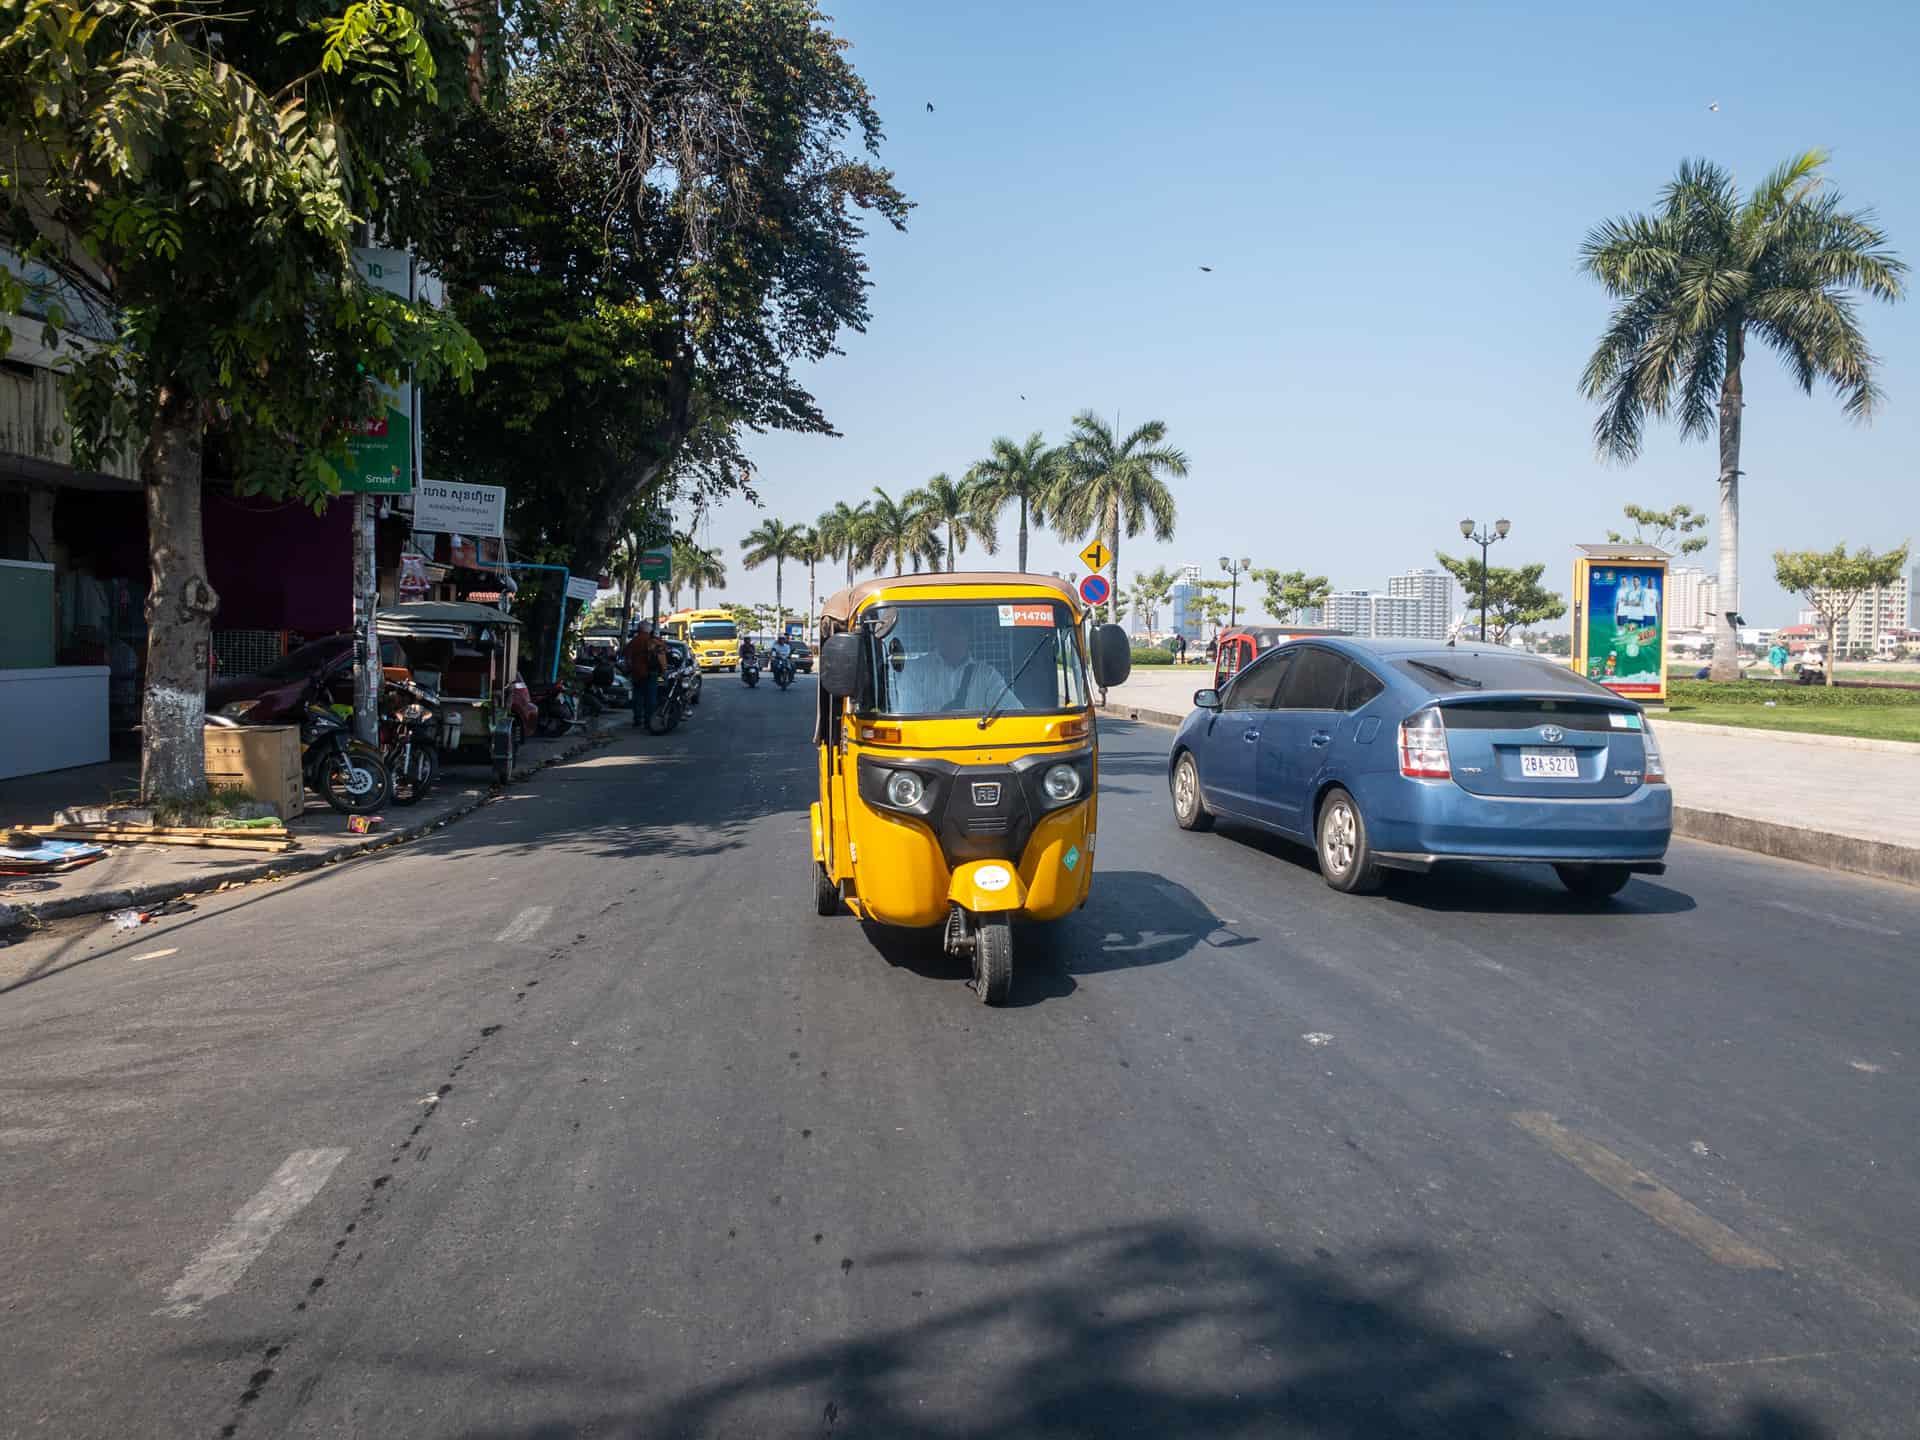 Uber Cambodia Feature Image, Yellow Tuk Tuk